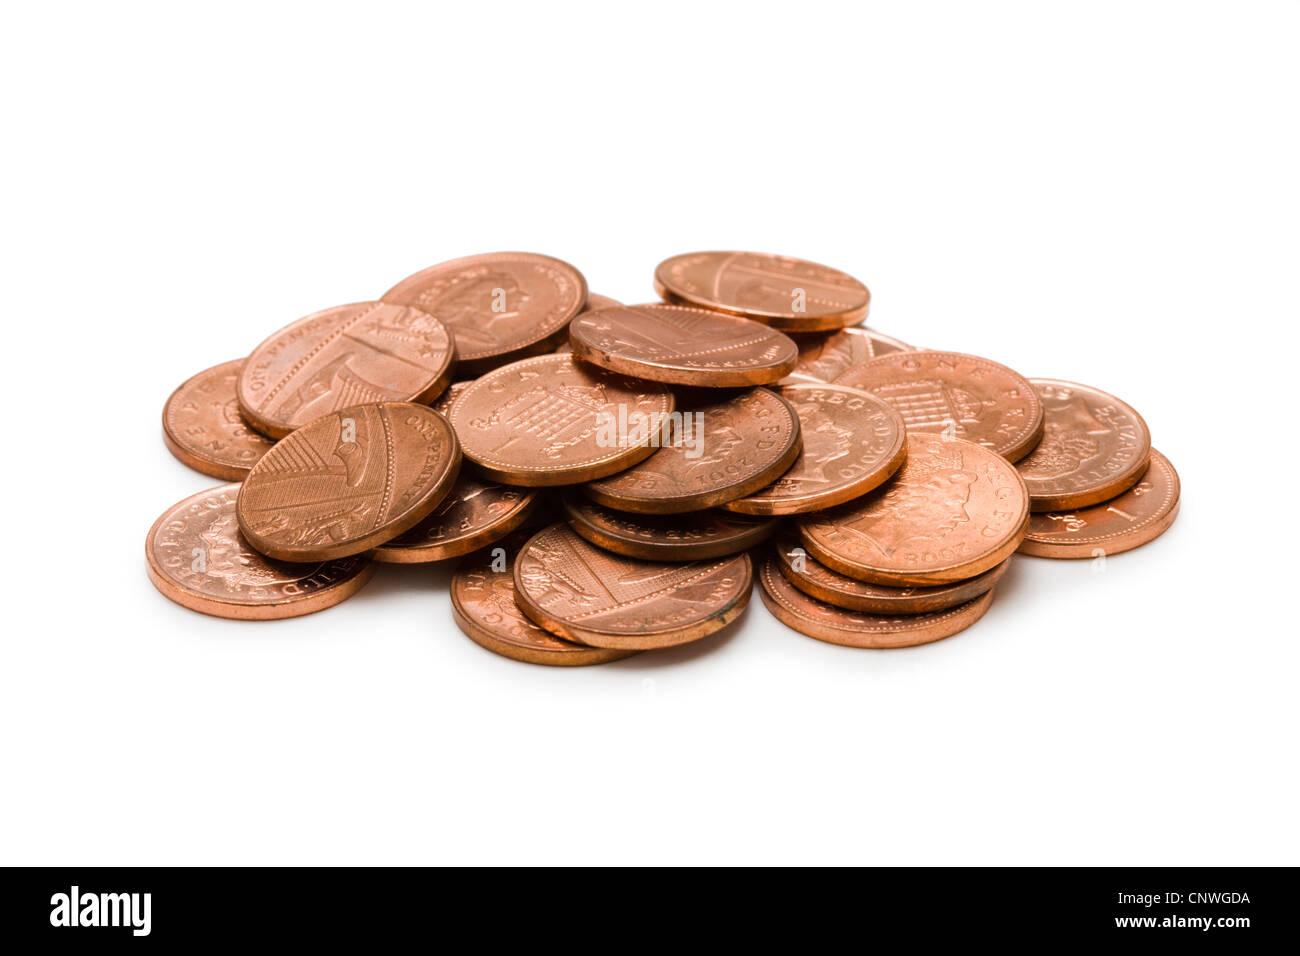 Pennies (British). - Stock Image